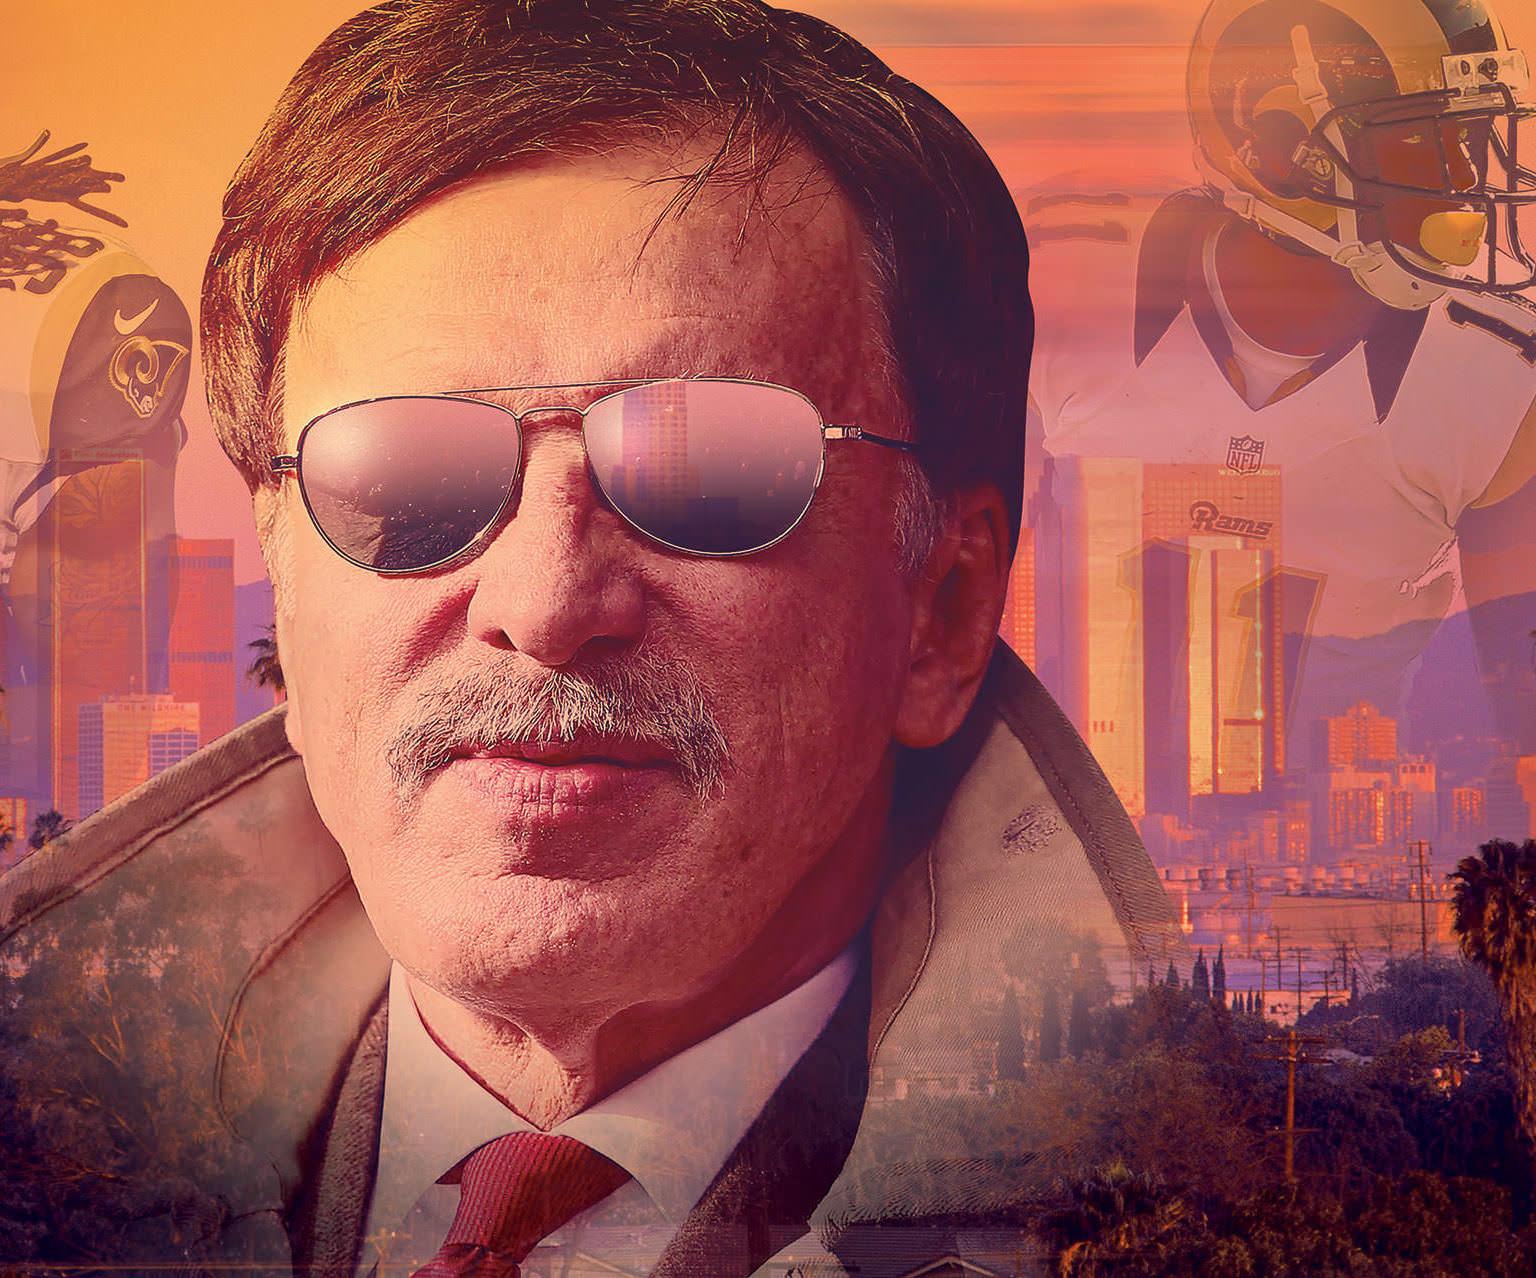 NFL Owner Stan Kroenke Wants to Take Over L.A.